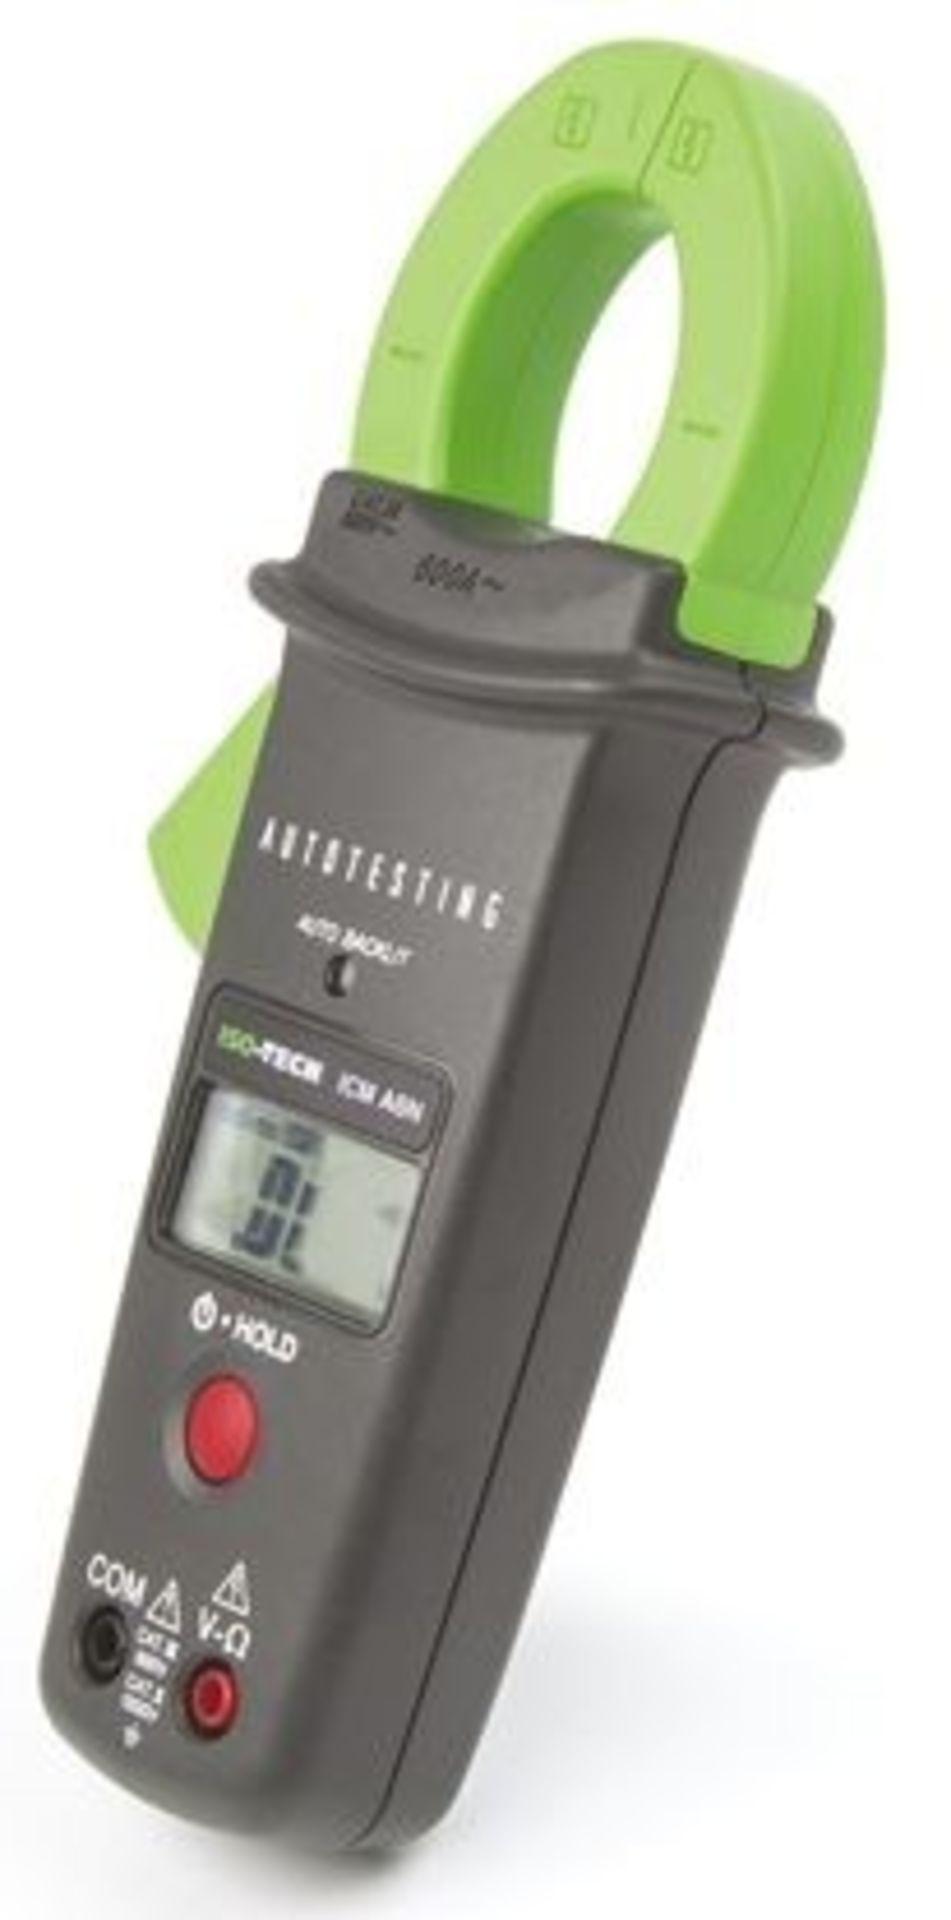 ISO-TECH ICMA6 Clamp Meter, Max Current 600A ac CAT II 1000 V CAT III 600 V